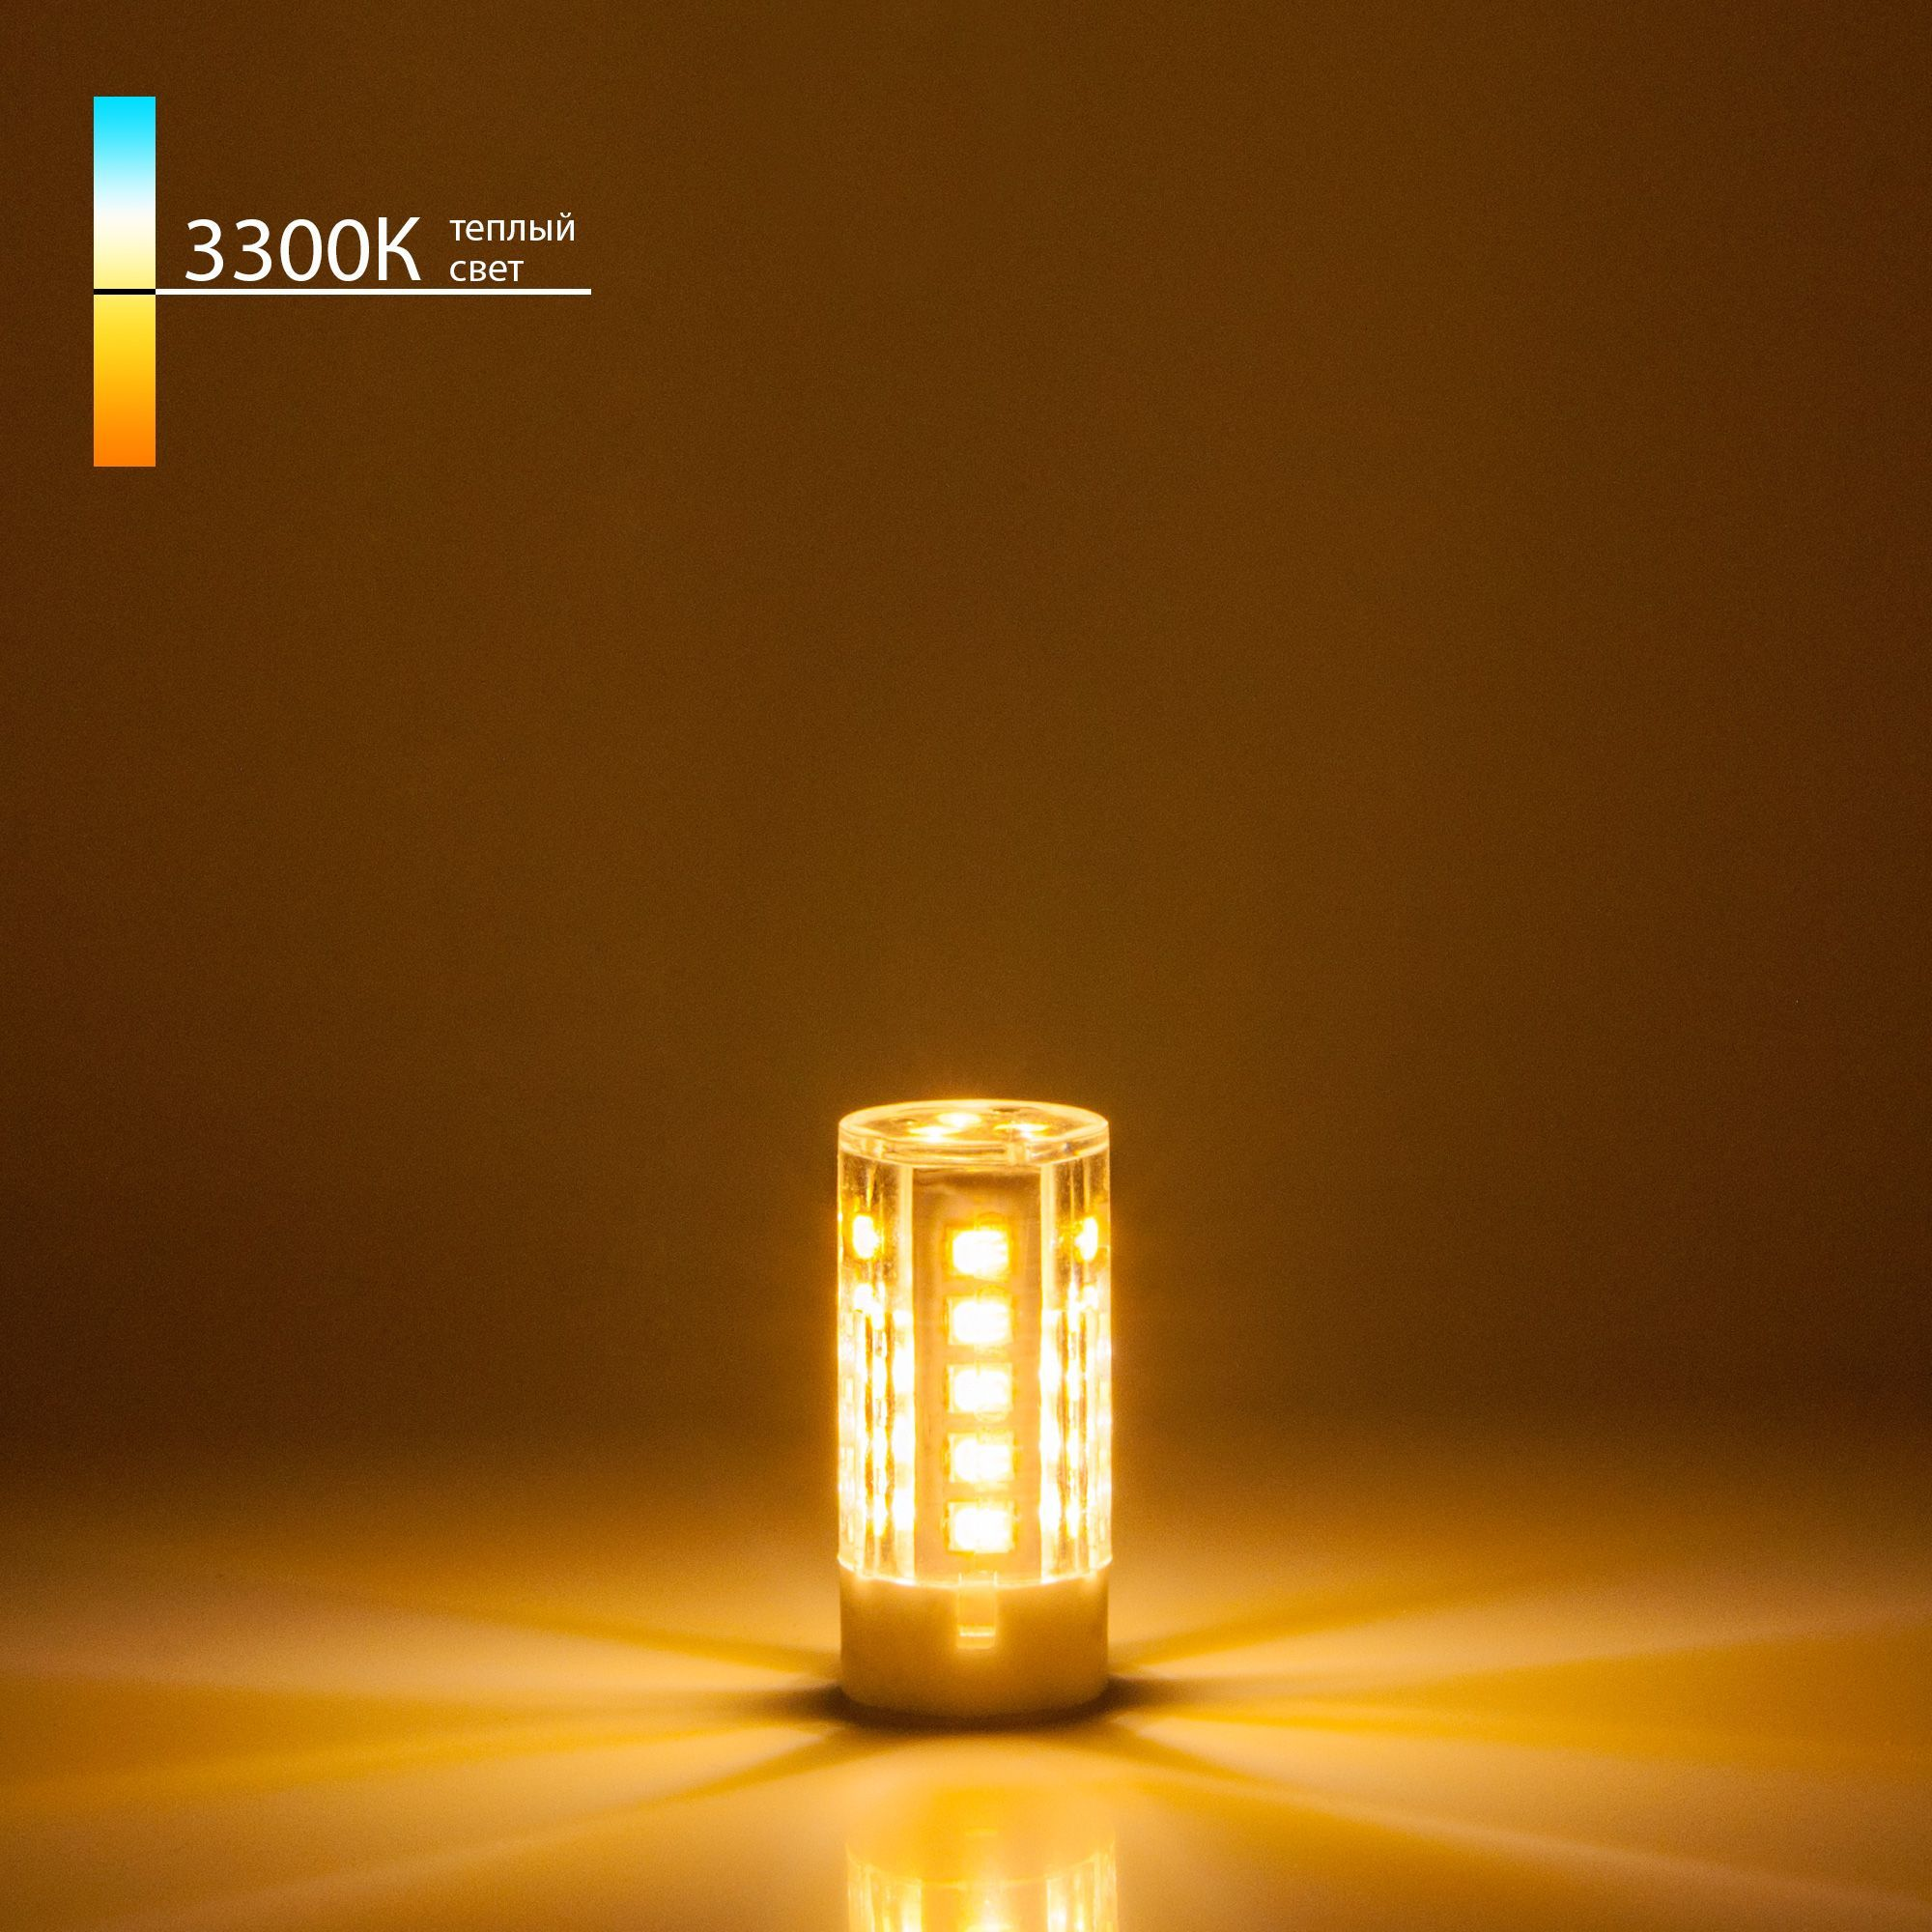 Cветодиодная лампа 5W 3300K G4 G4 LED 5W 220V 3300K